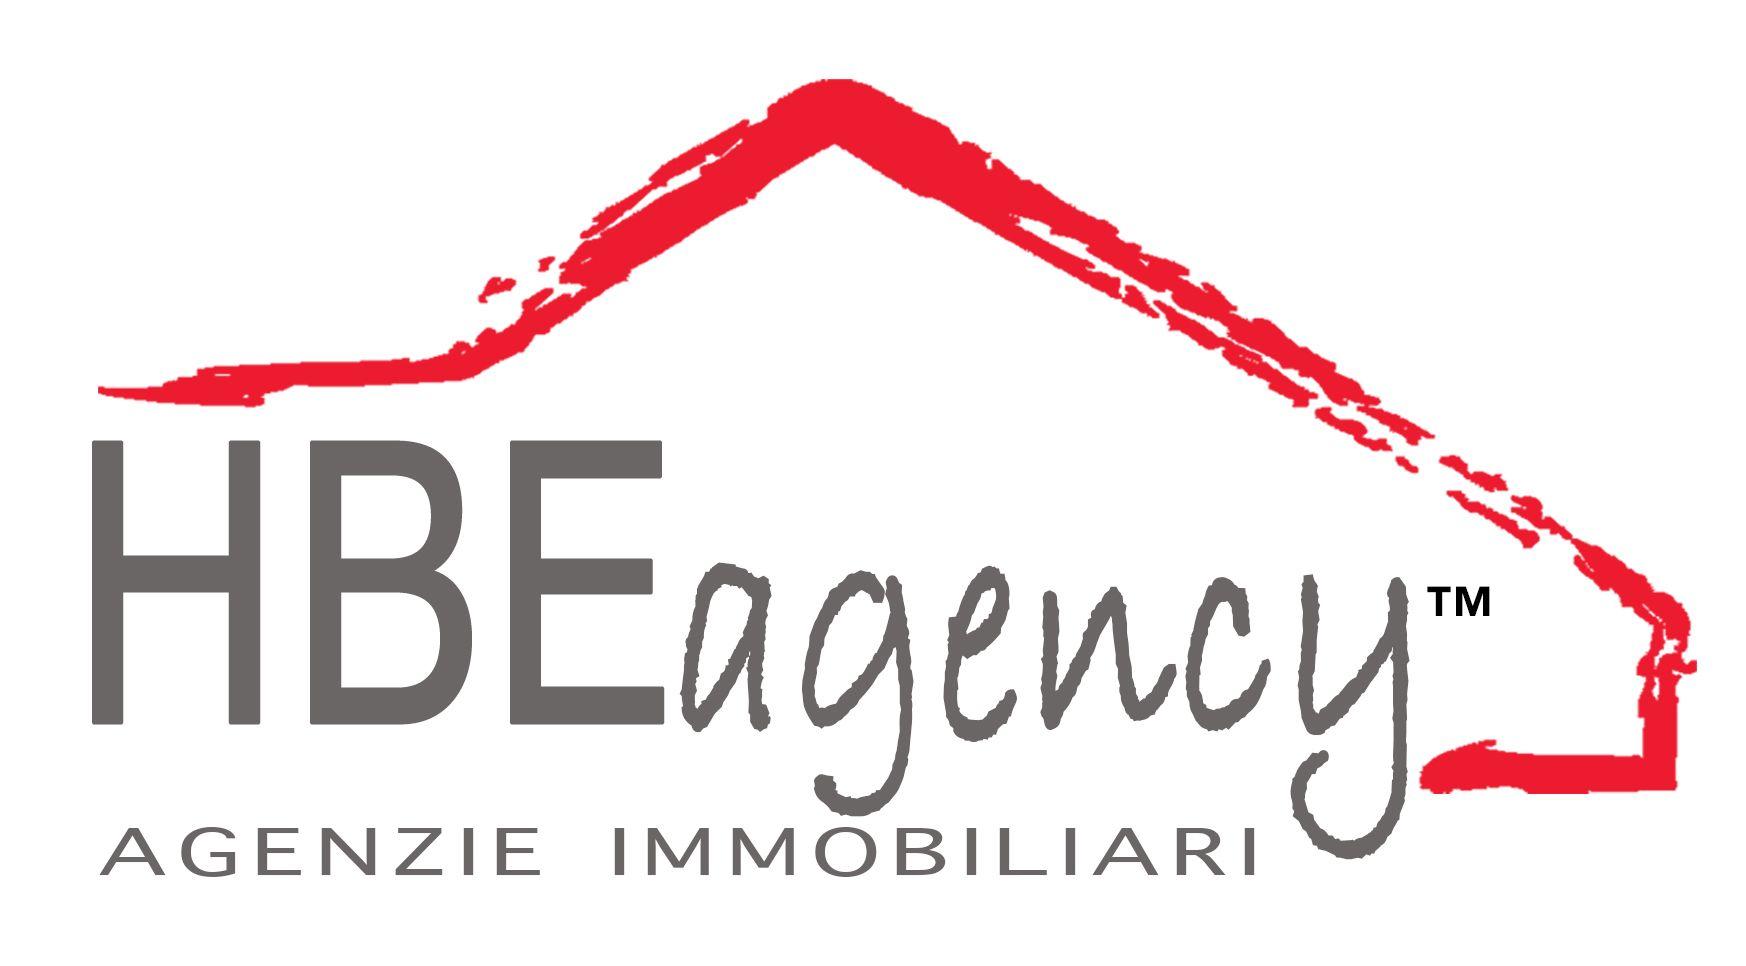 HBEagency